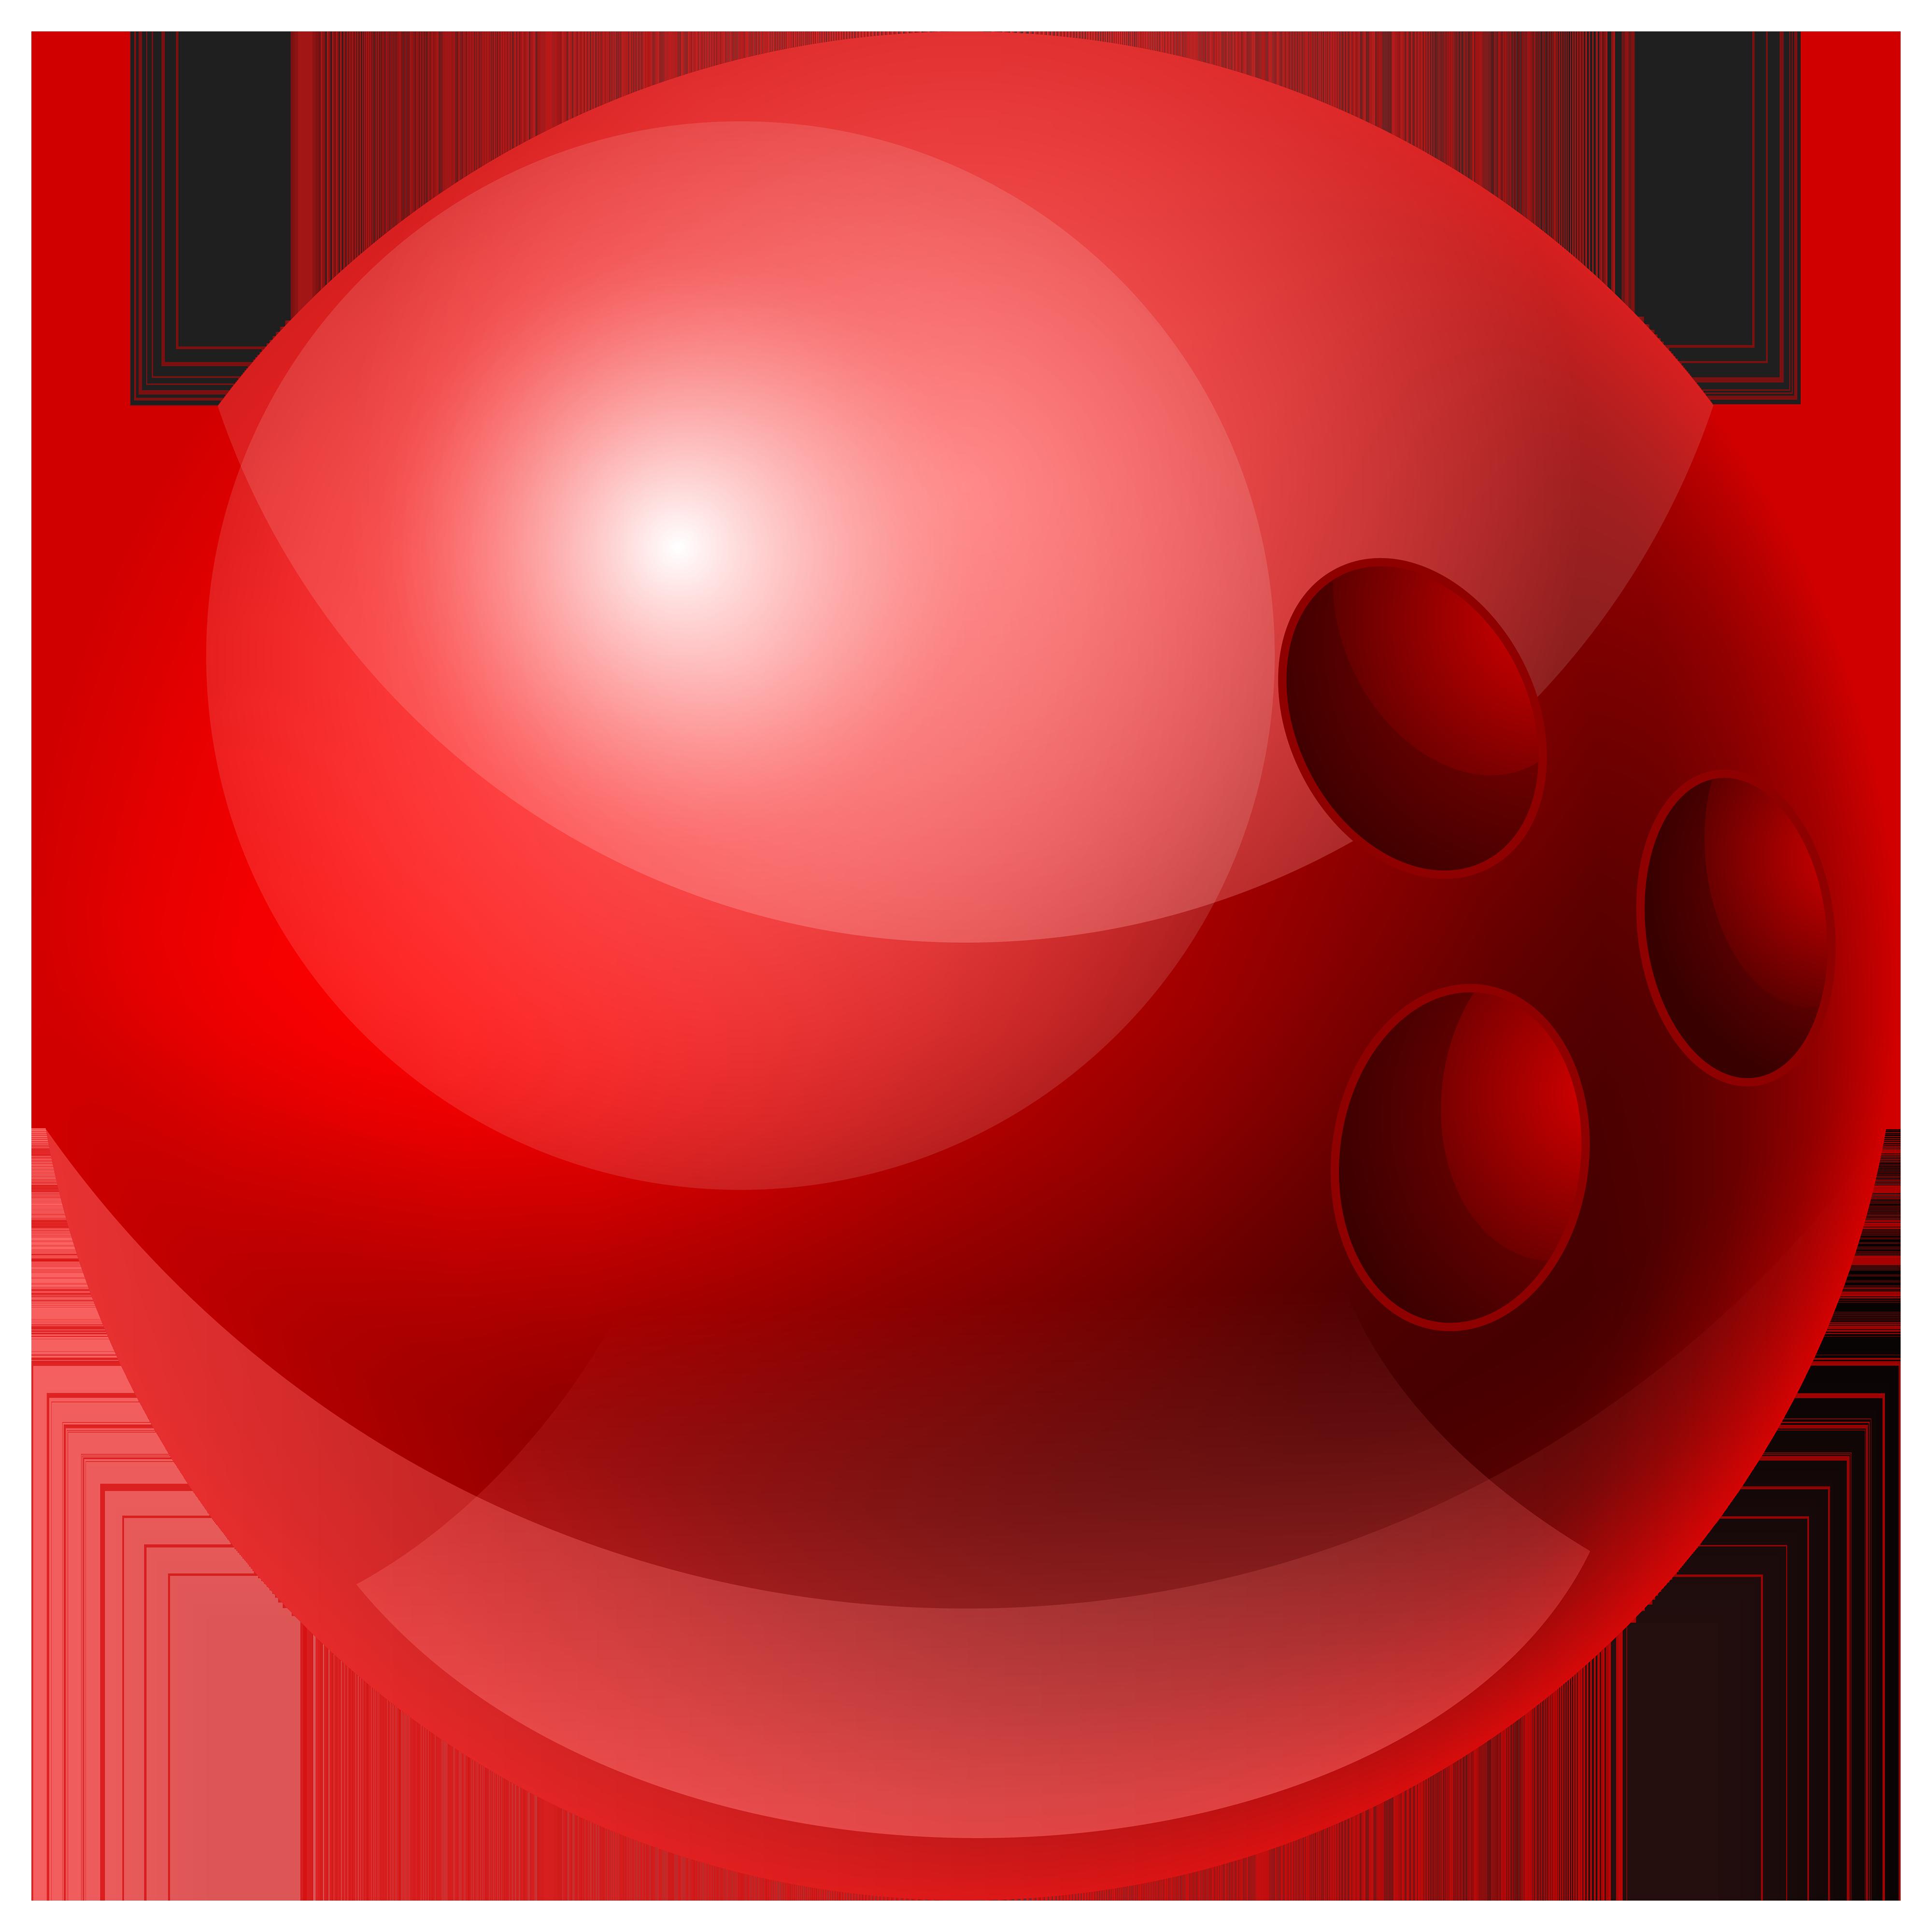 Bowling Ball Png Image Bowling Ball Bowling Clip Art